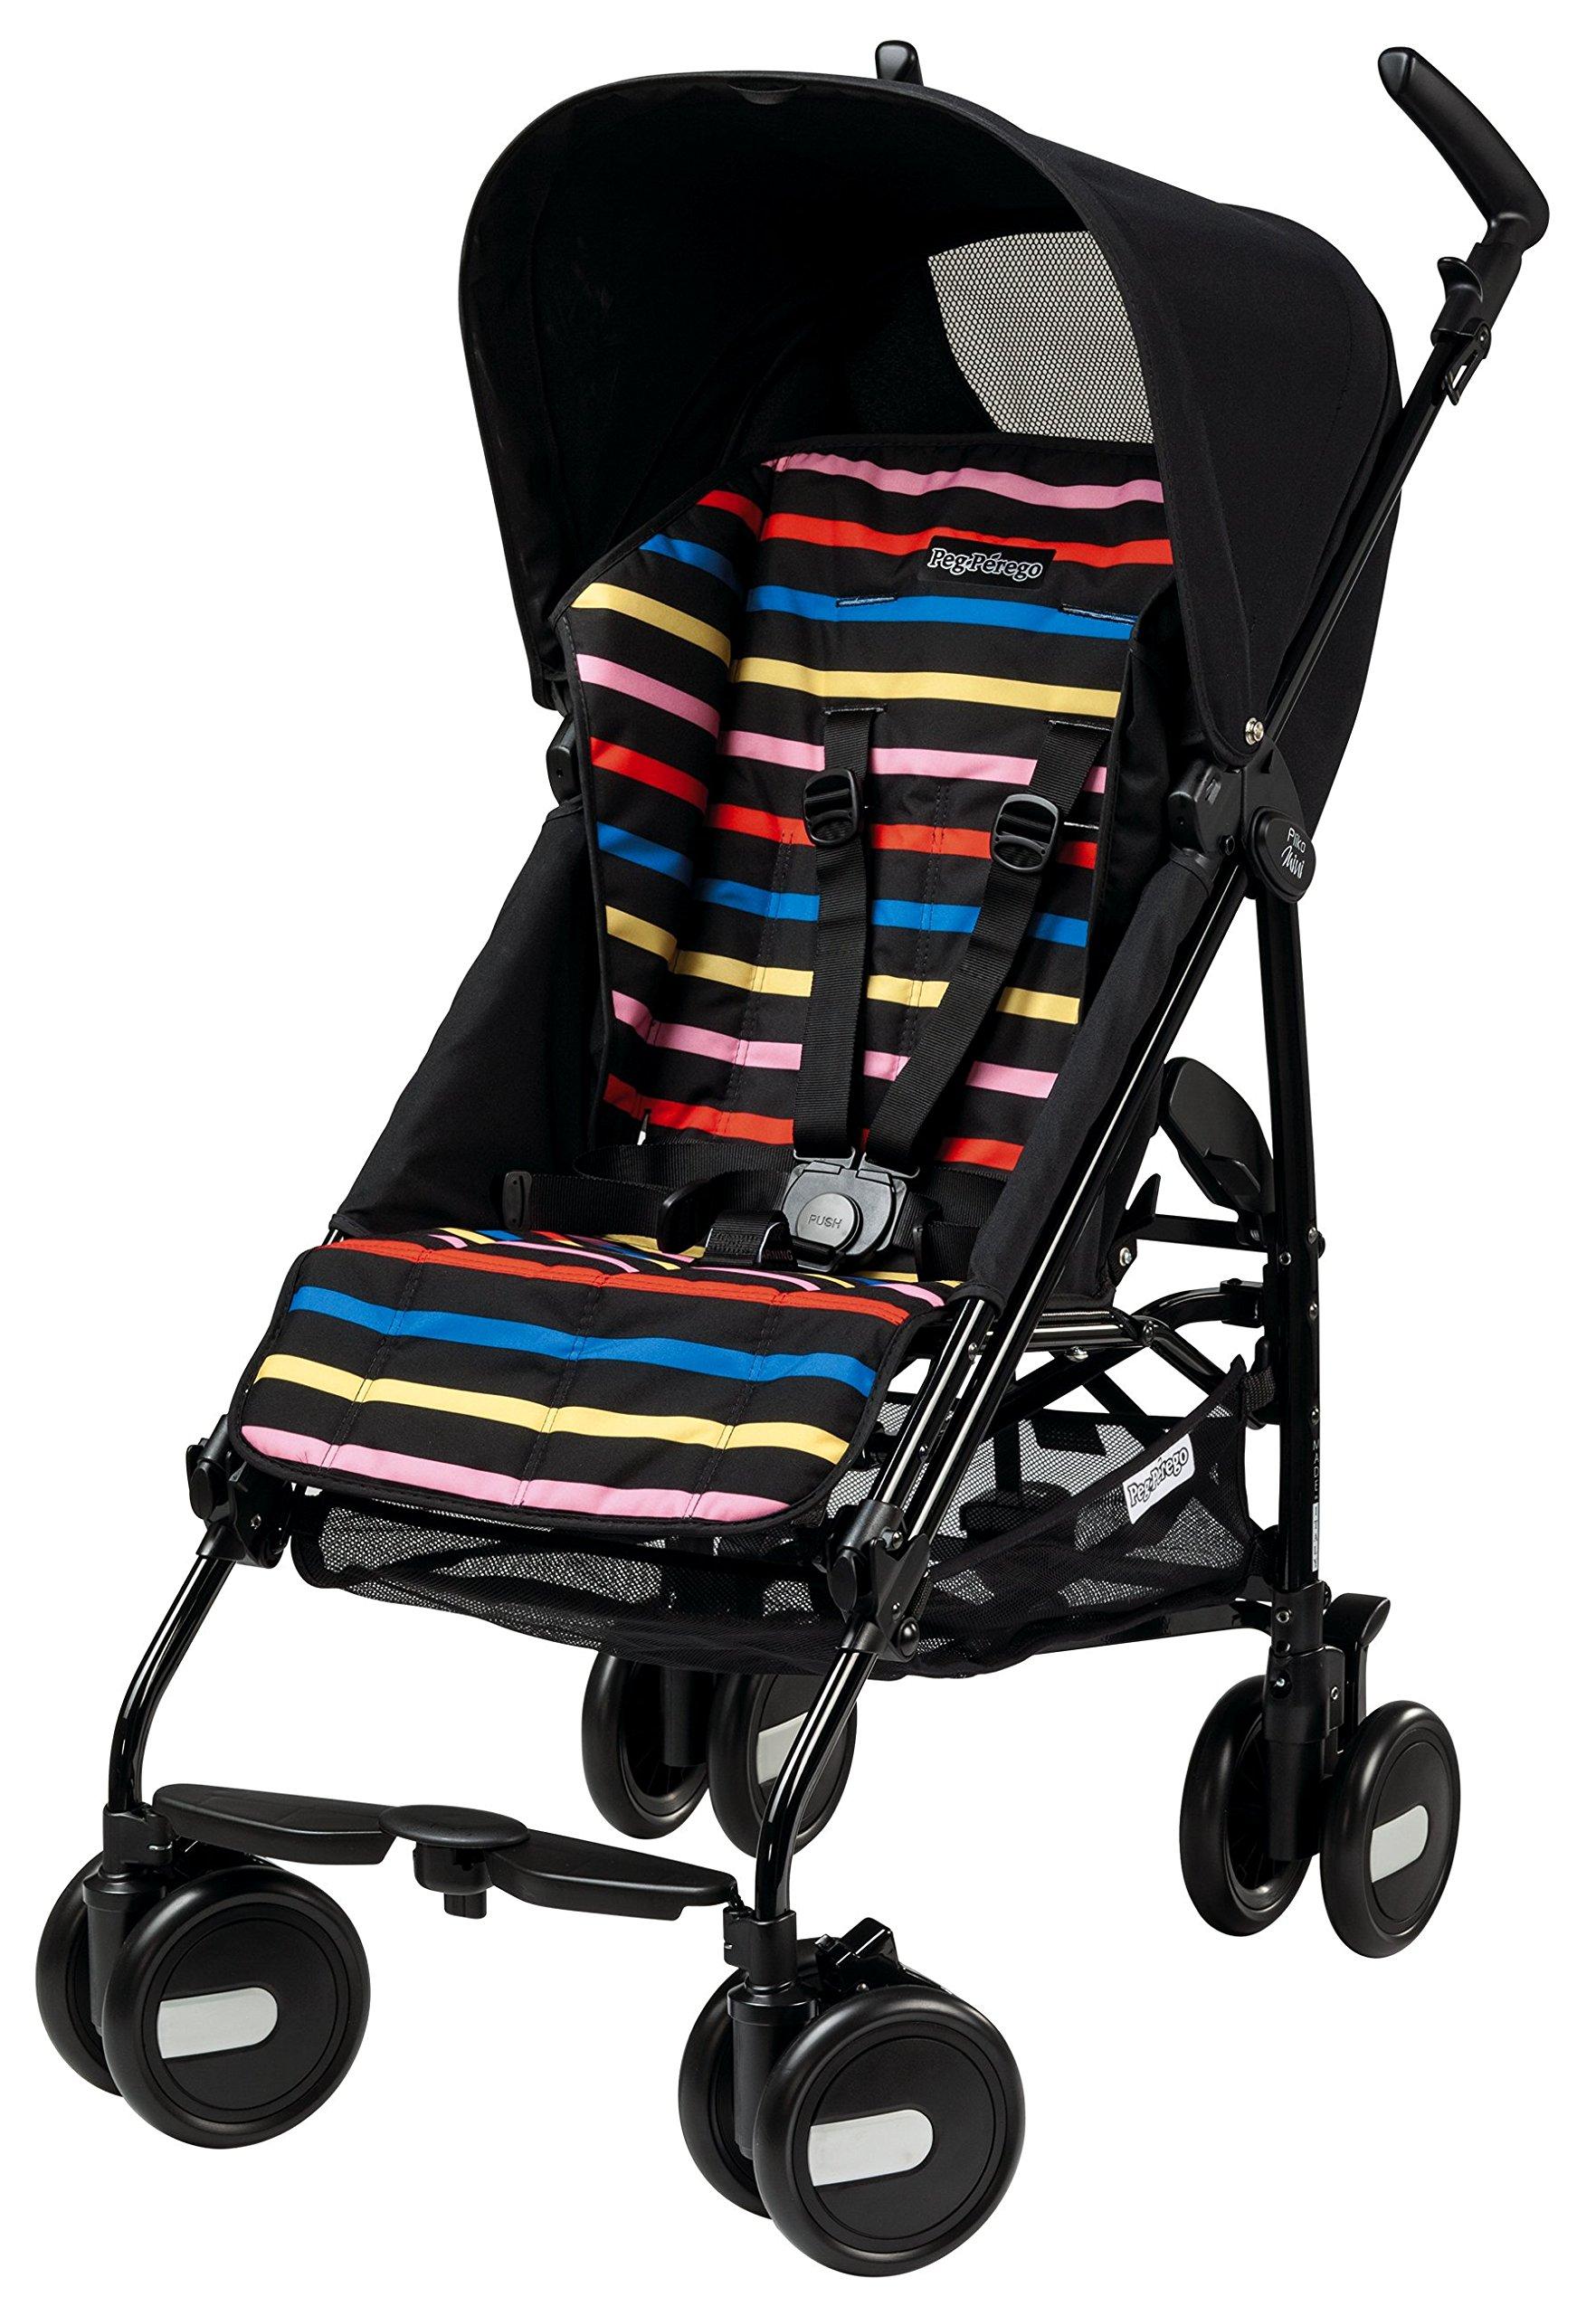 Peg Perego - IPKR280035RO01RS01 - Poussette Mini - Neon product image